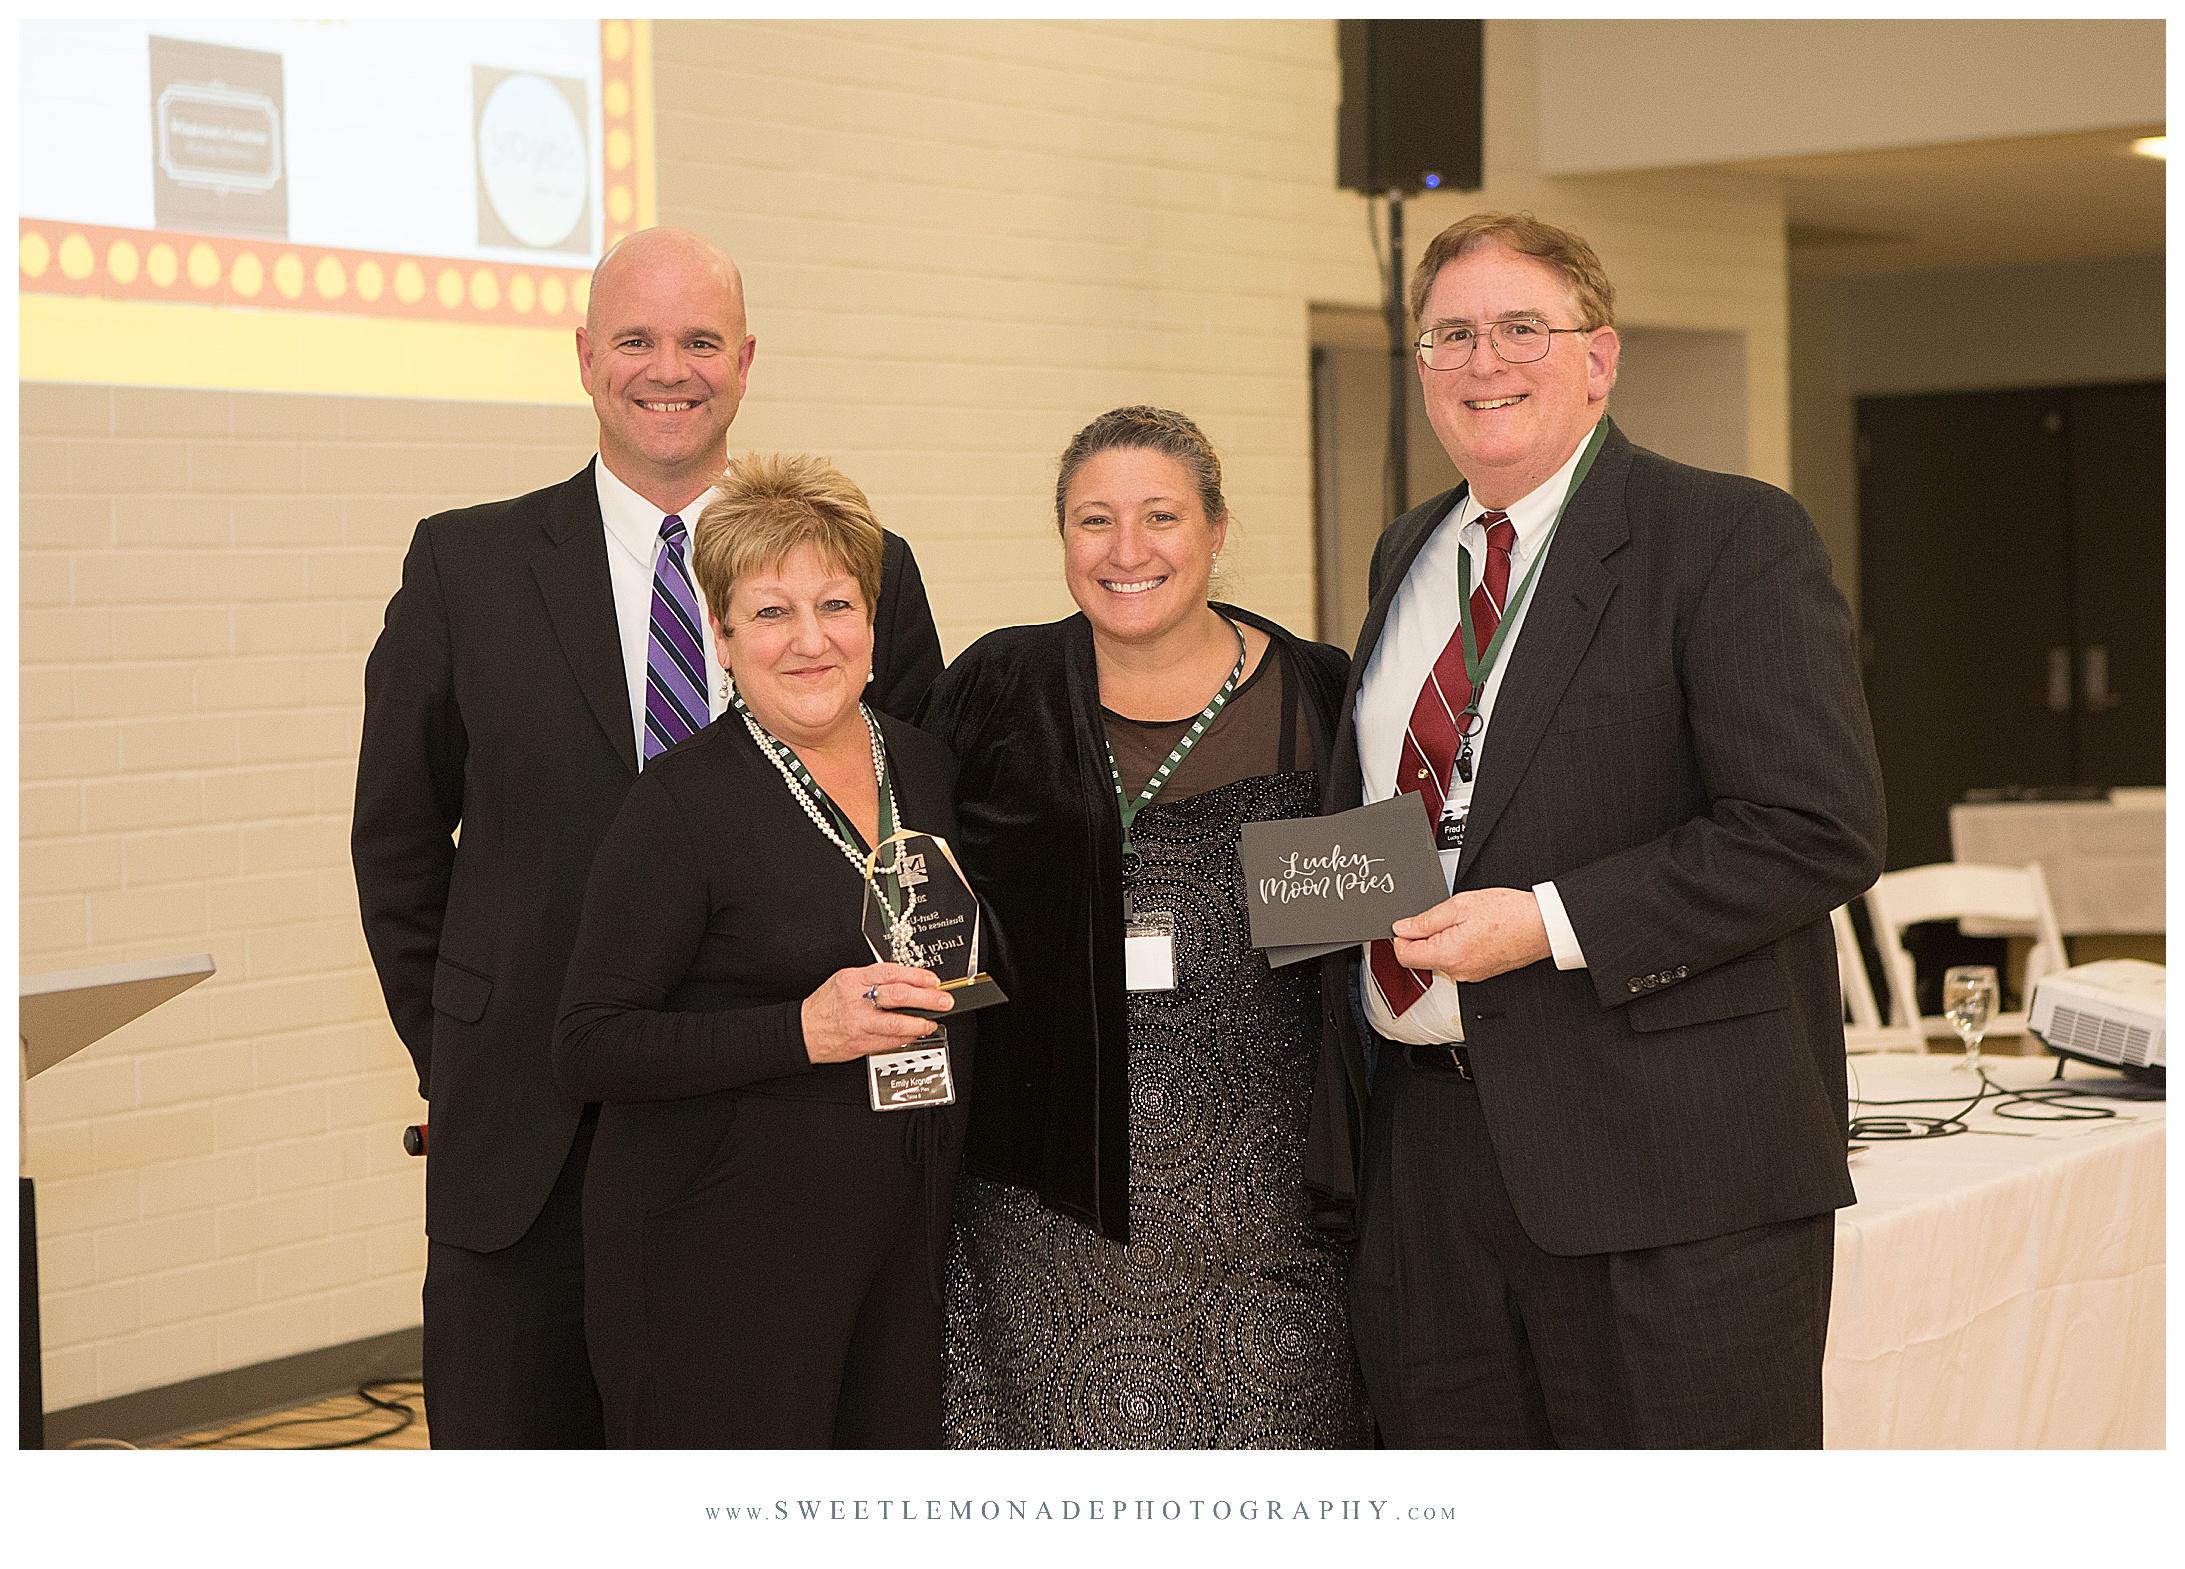 champaign-illinois-senior-photographer-chamber-awards ceremony_2389.jpg